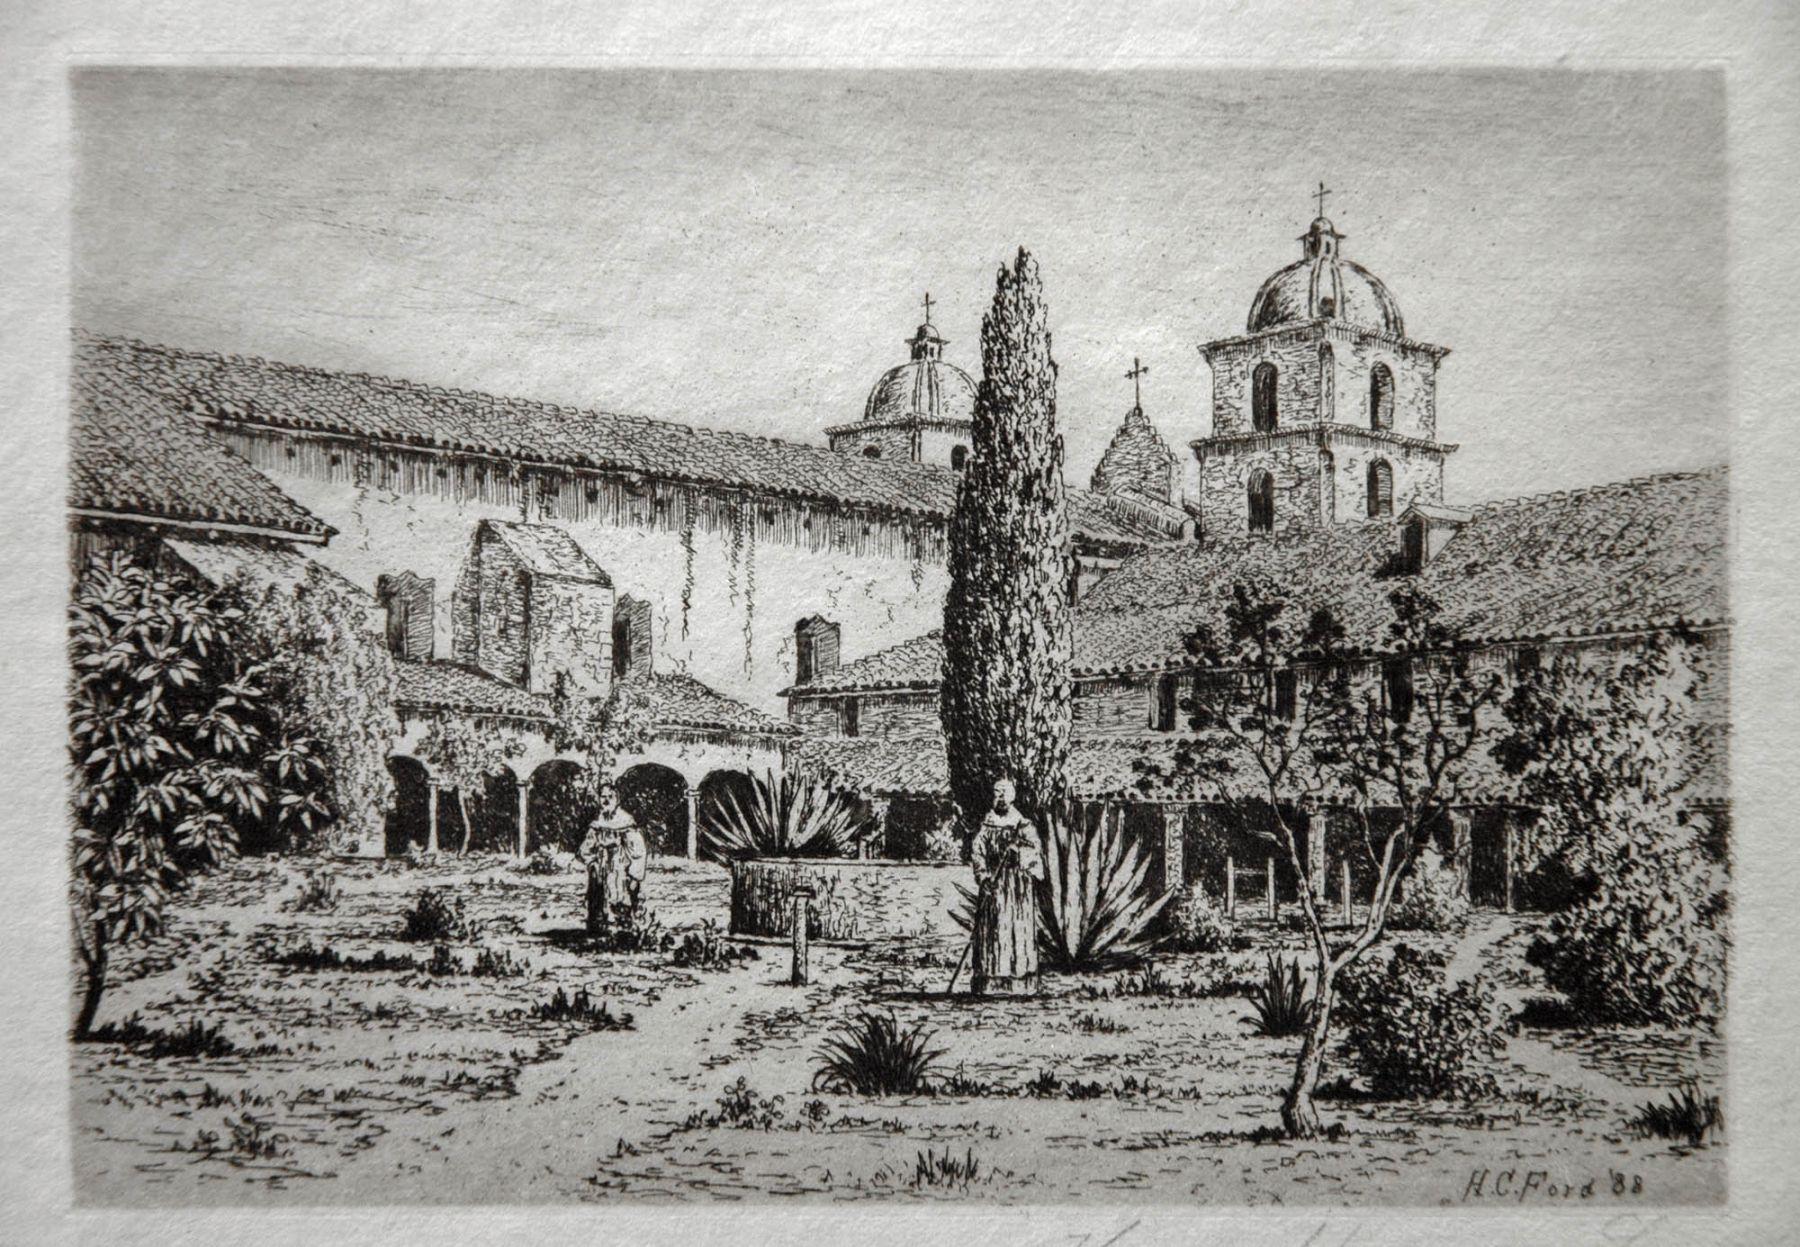 Henry Chapman Ford, Santa Barbara Mission Courtyard